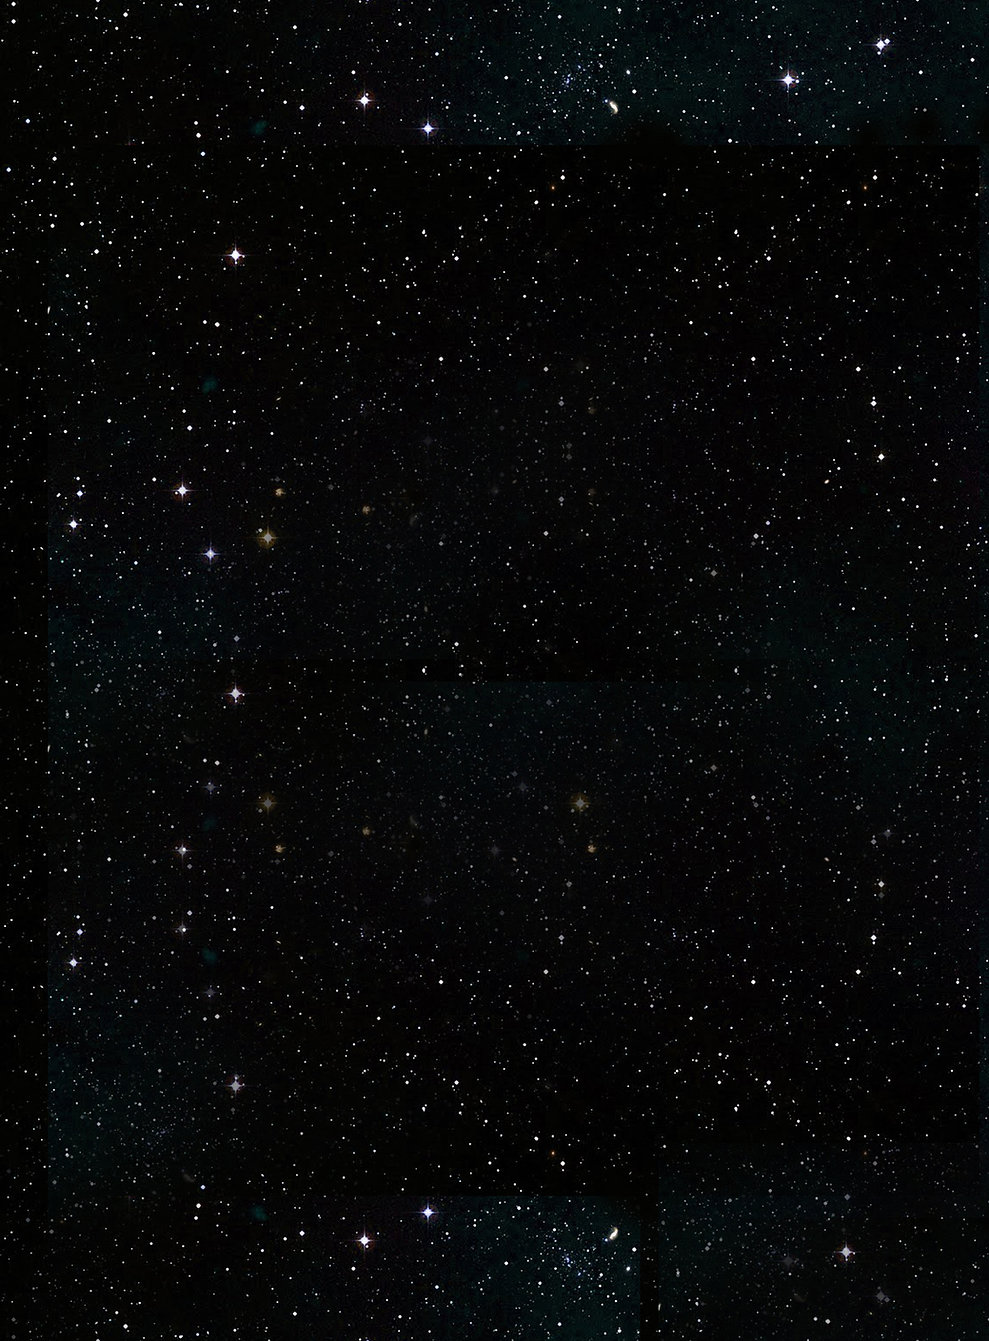 Star Wars_Star_Field.jpg